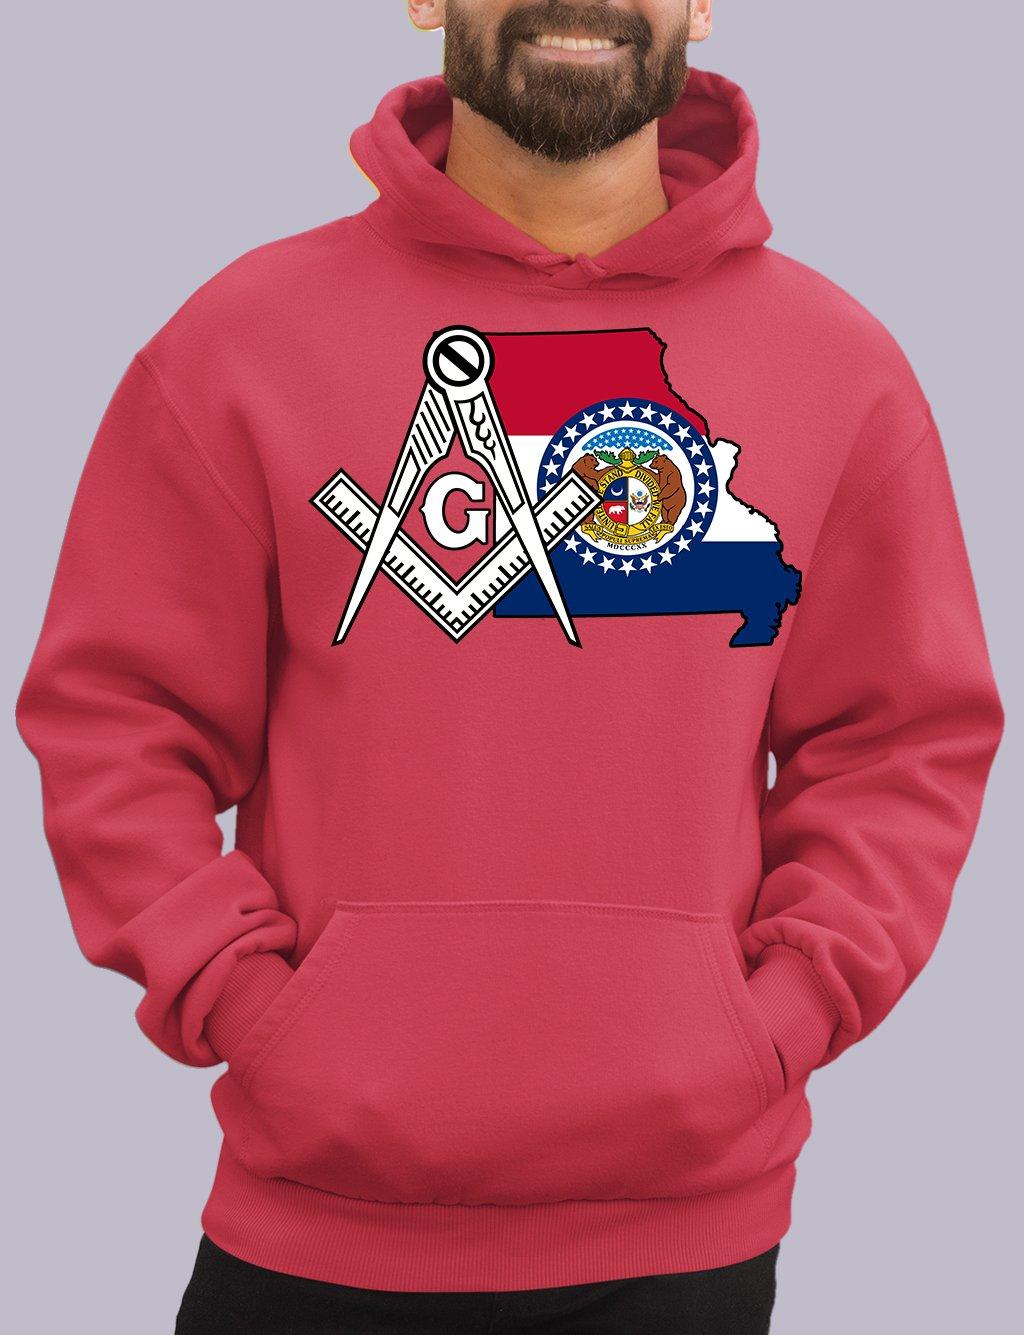 Missouri Masonic Hoodie | MASONIC VIBE